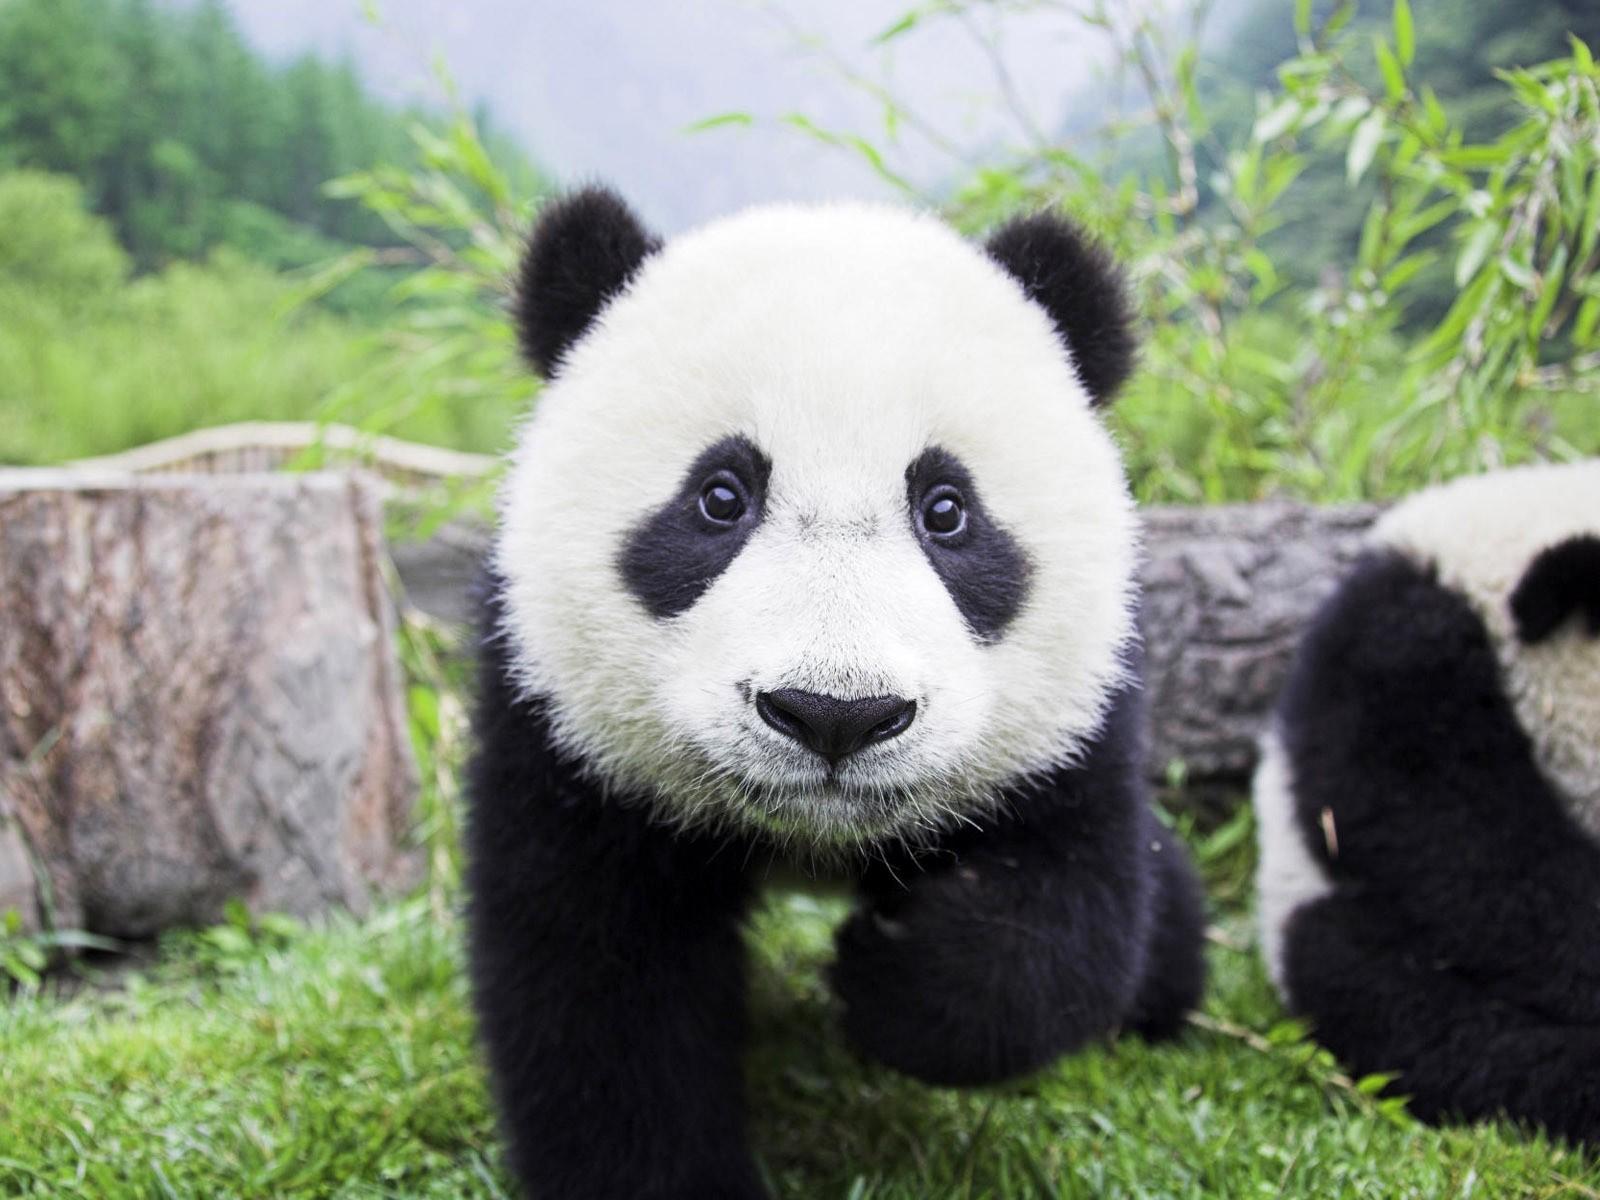 ВМосковский зоопарк обещали привезти панд